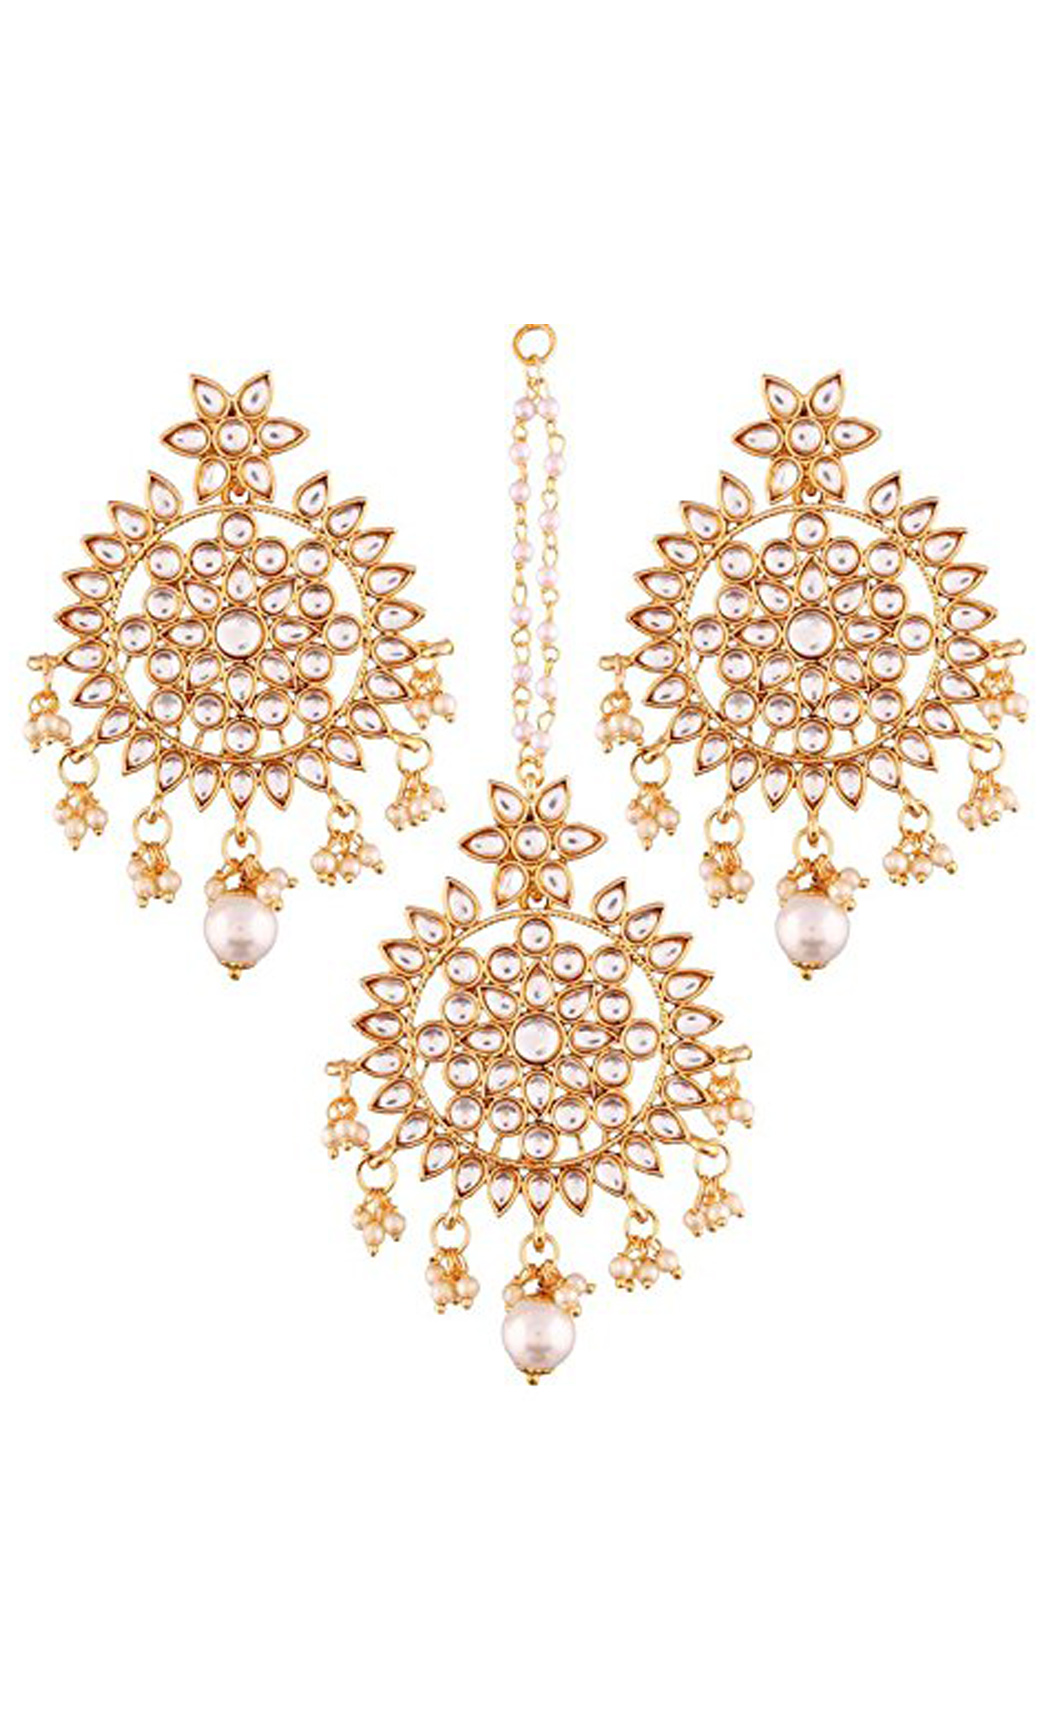 Flower Kundan Chaandbali Earrings and Maang Tikka Gold Plated| Indian Bridal Jewellery Sets With Price